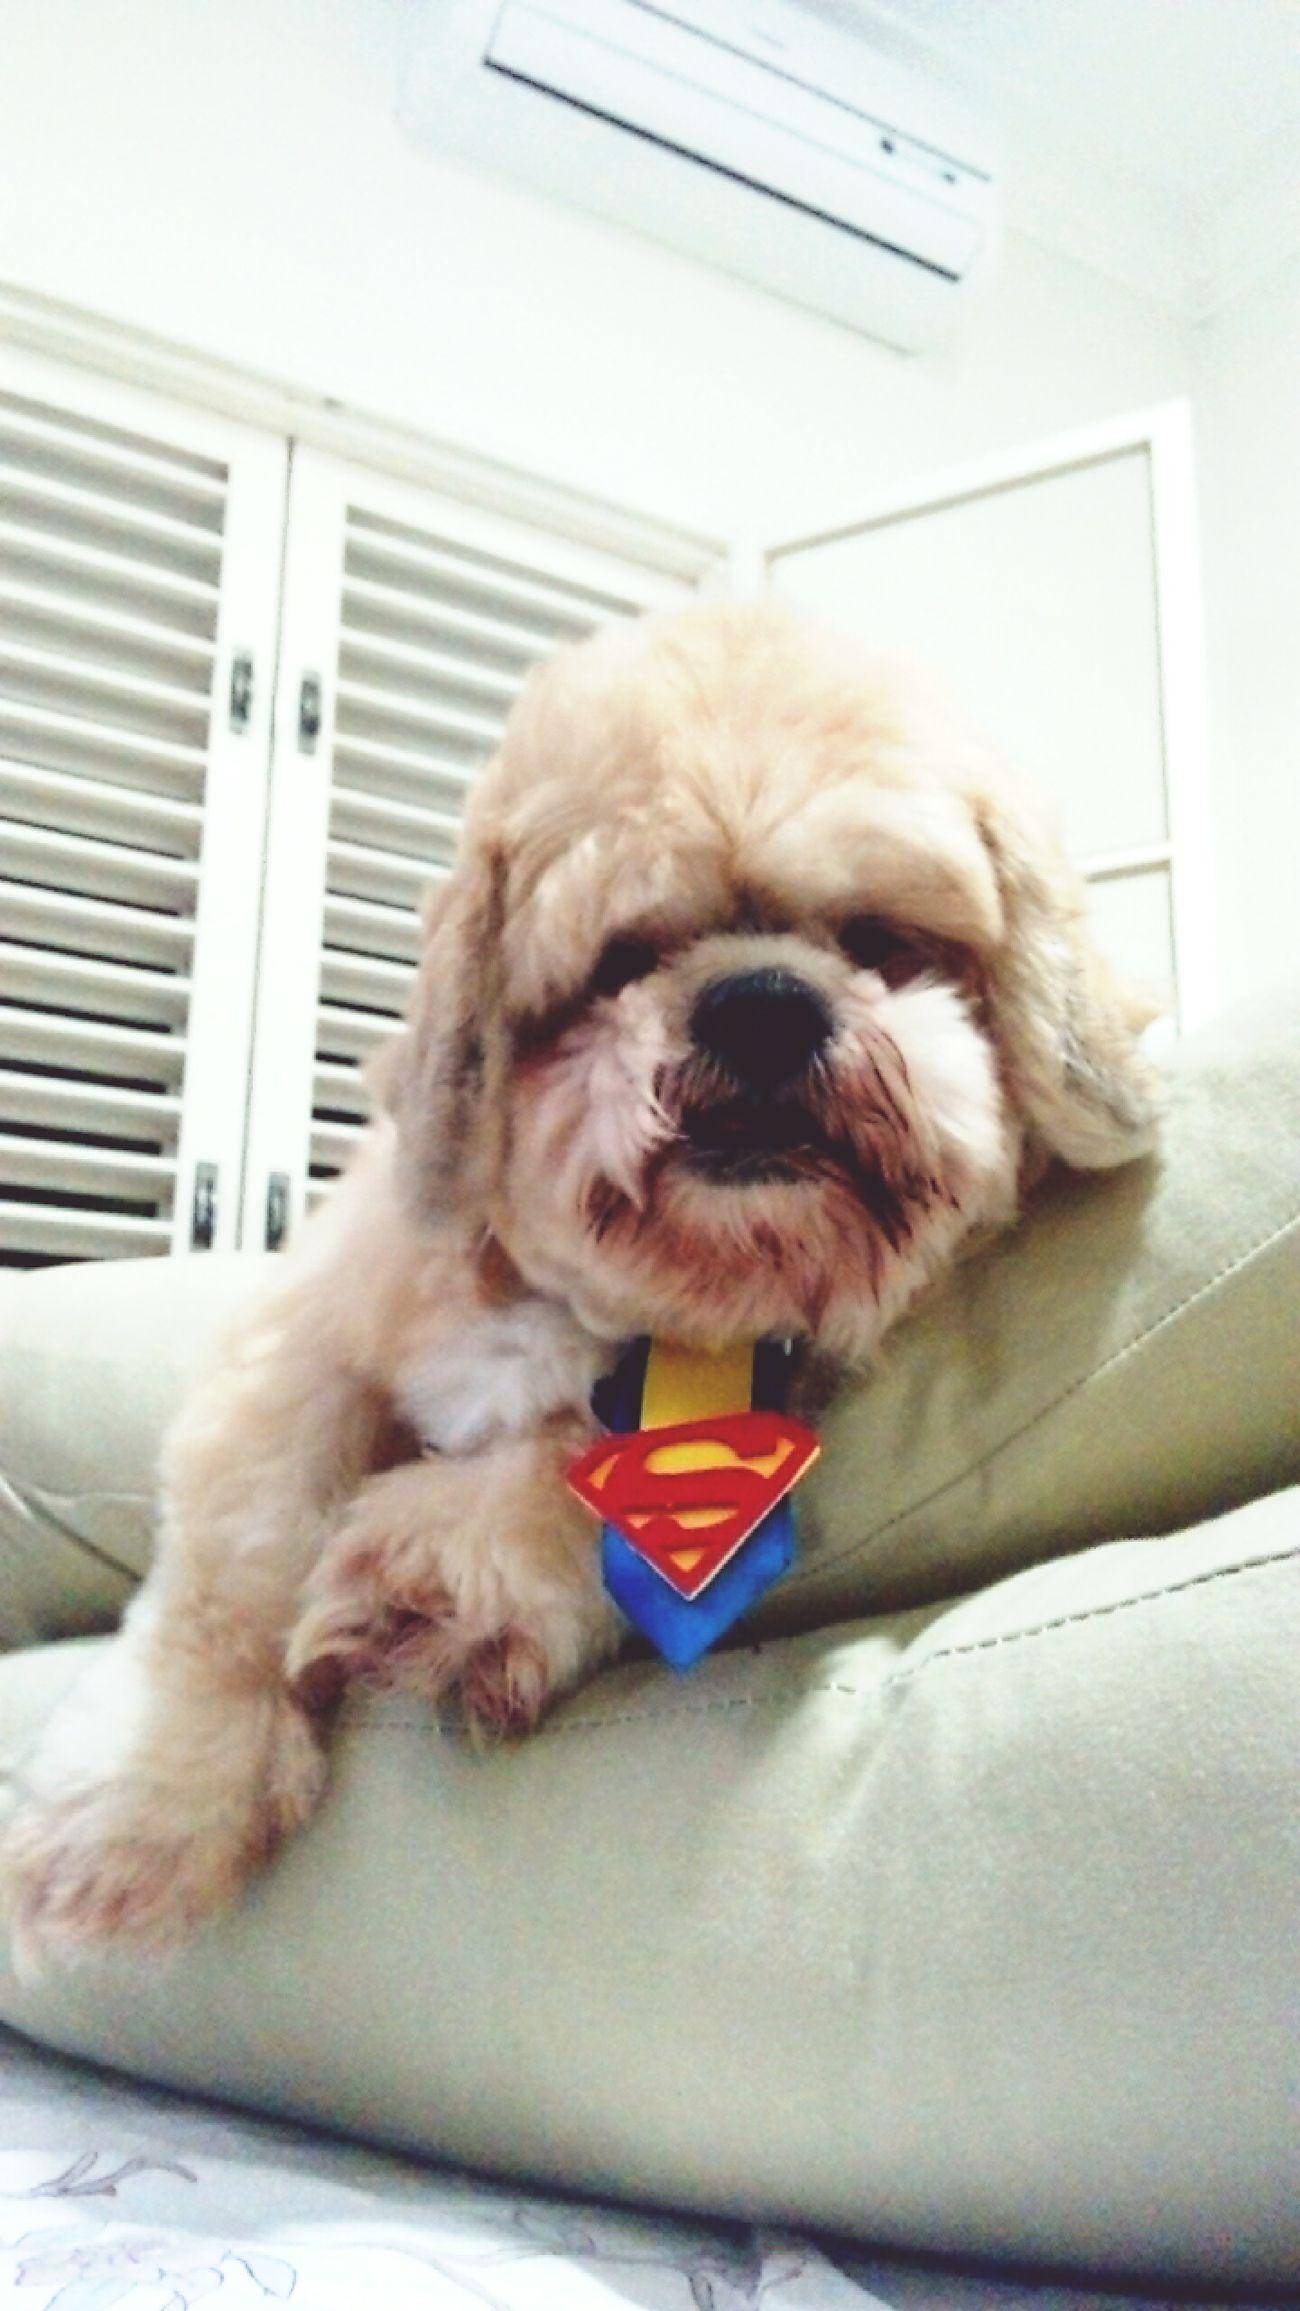 My superhero! Superman ♡ Superdog Superhero Superstar Super Cute Dog  Cute♡ Pets Are Family Pet Photography  Dogslife Dog❤ My Angel ❤ MINE ! ♥